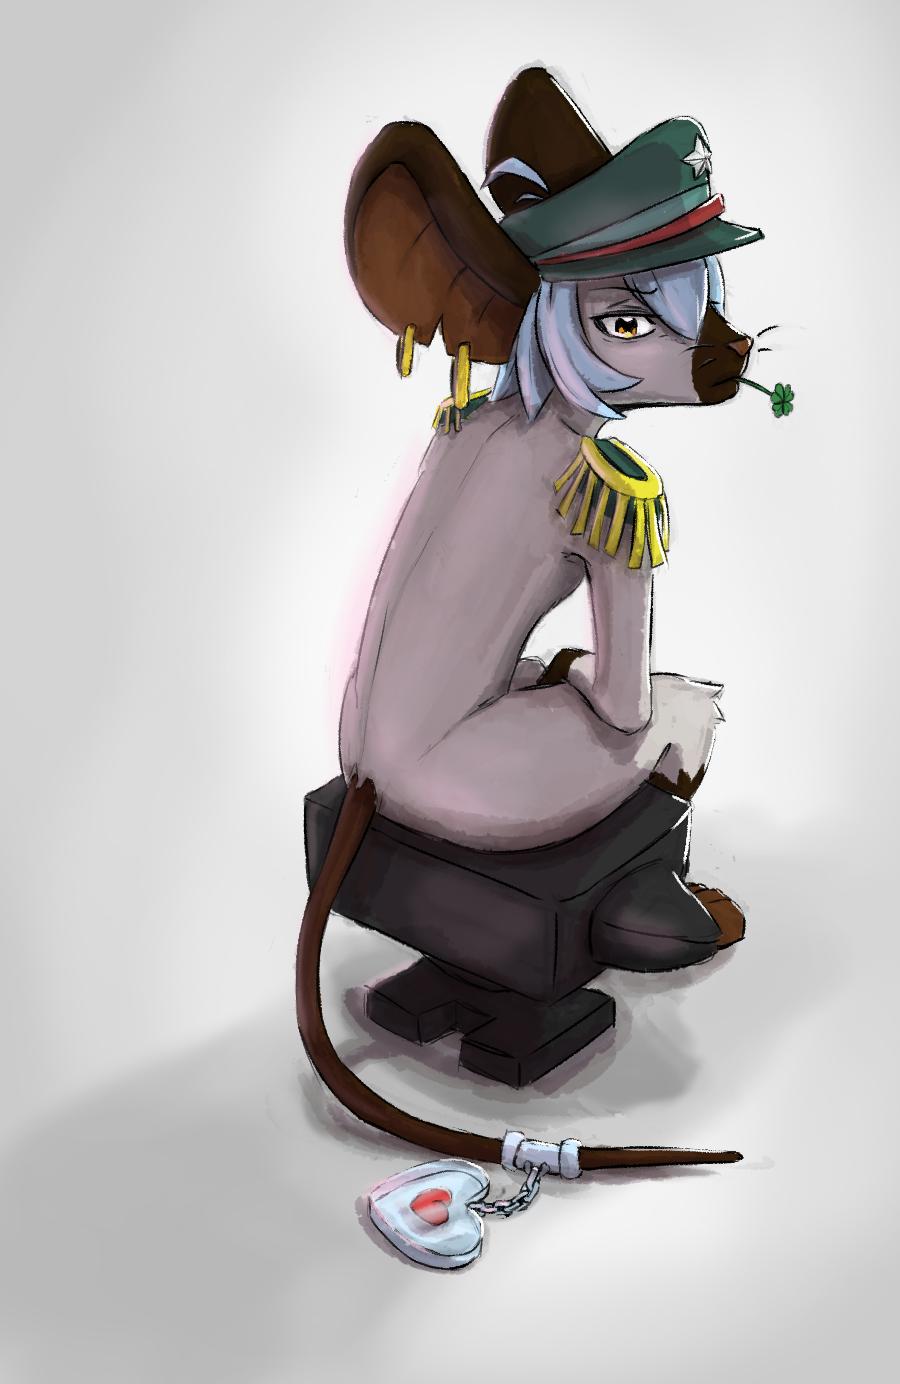 General mousey by sankaritinn